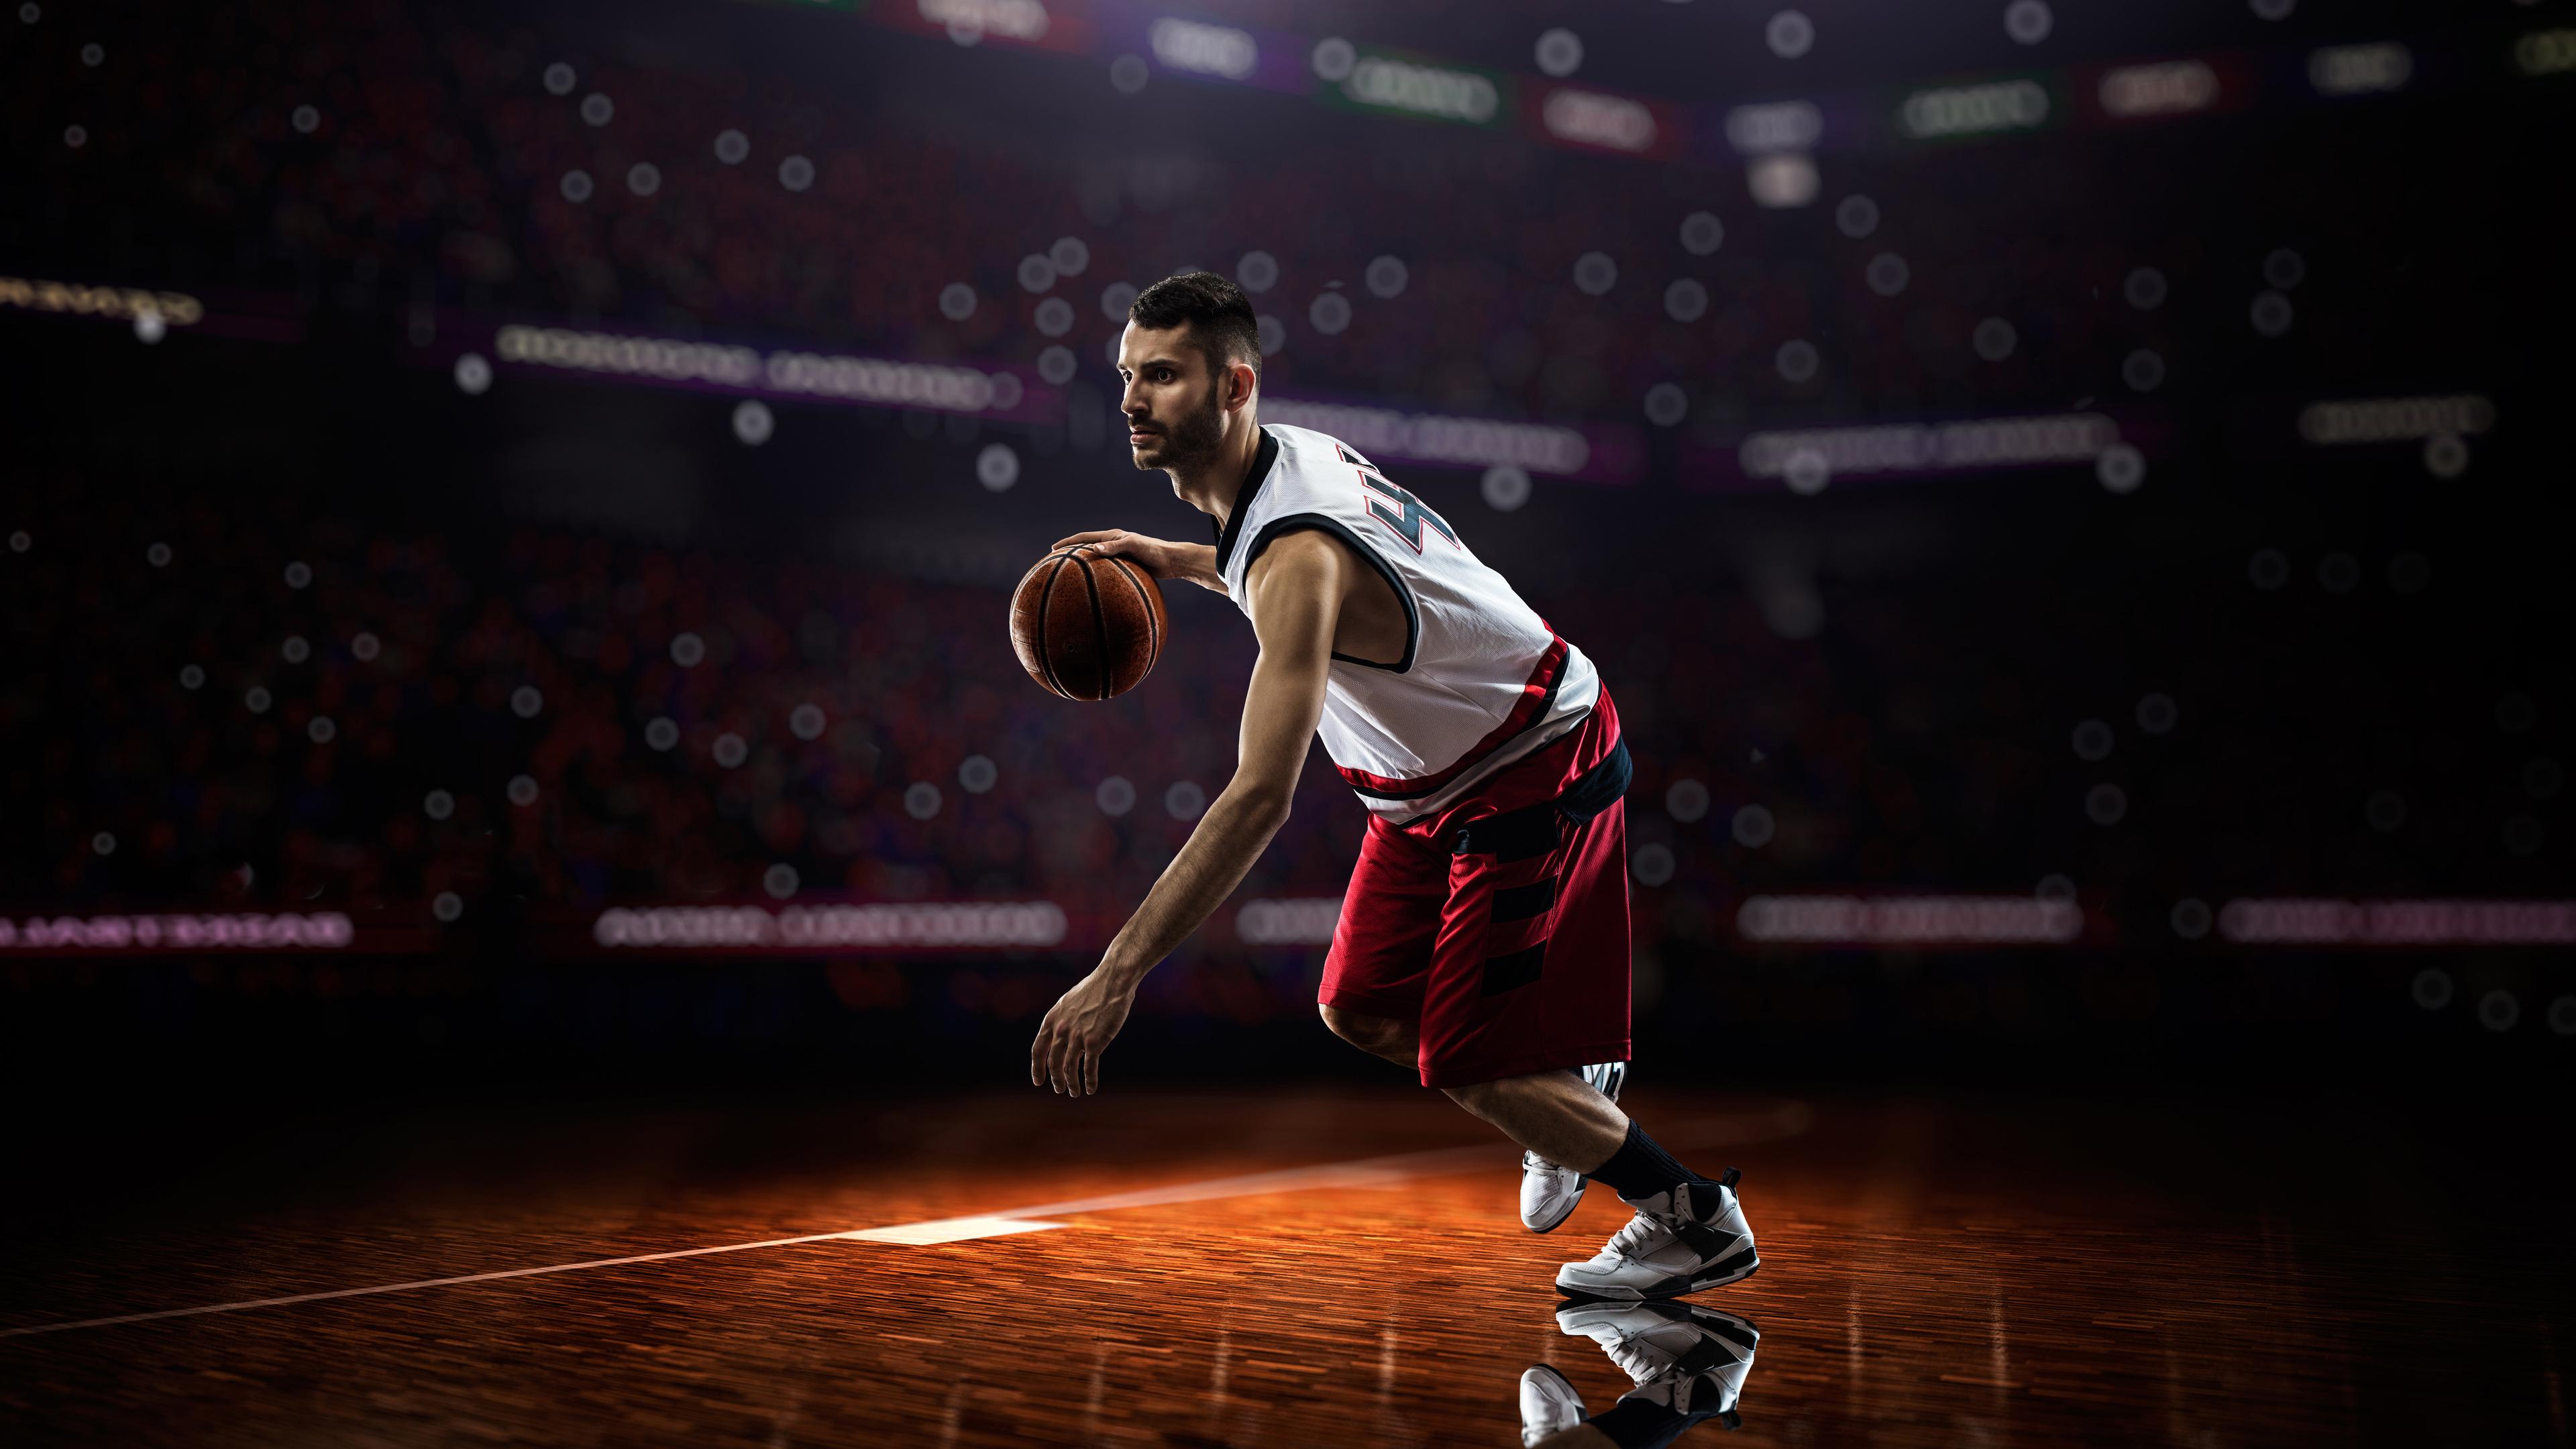 Wallpaper 4k Basketball Player 8k 4k wallpapers 5k wallpapers 8k 3840x2160